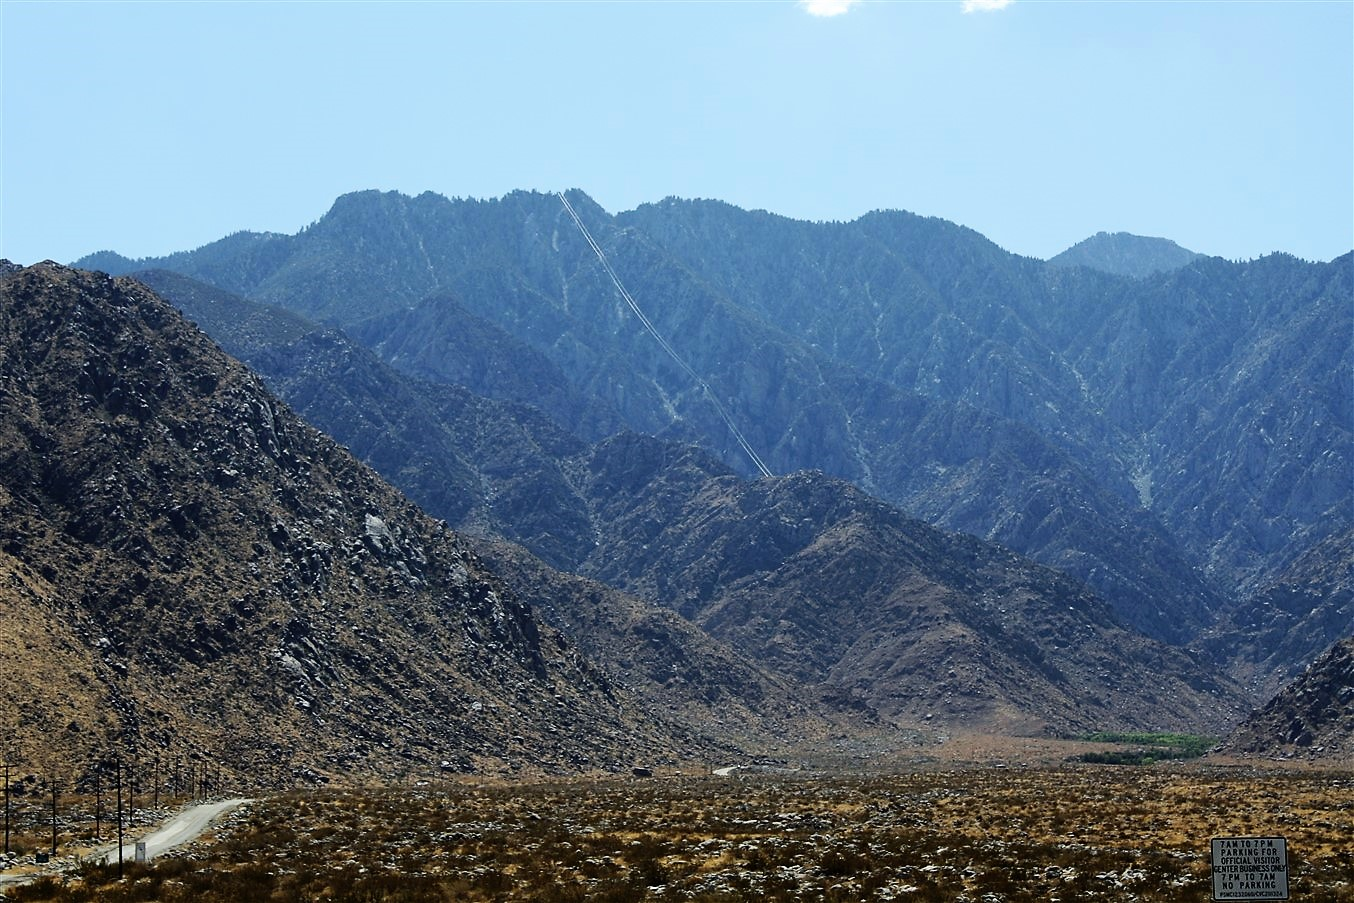 2009 08 24 58 Mt San Jacinto and Palm Springs Tram.jpg